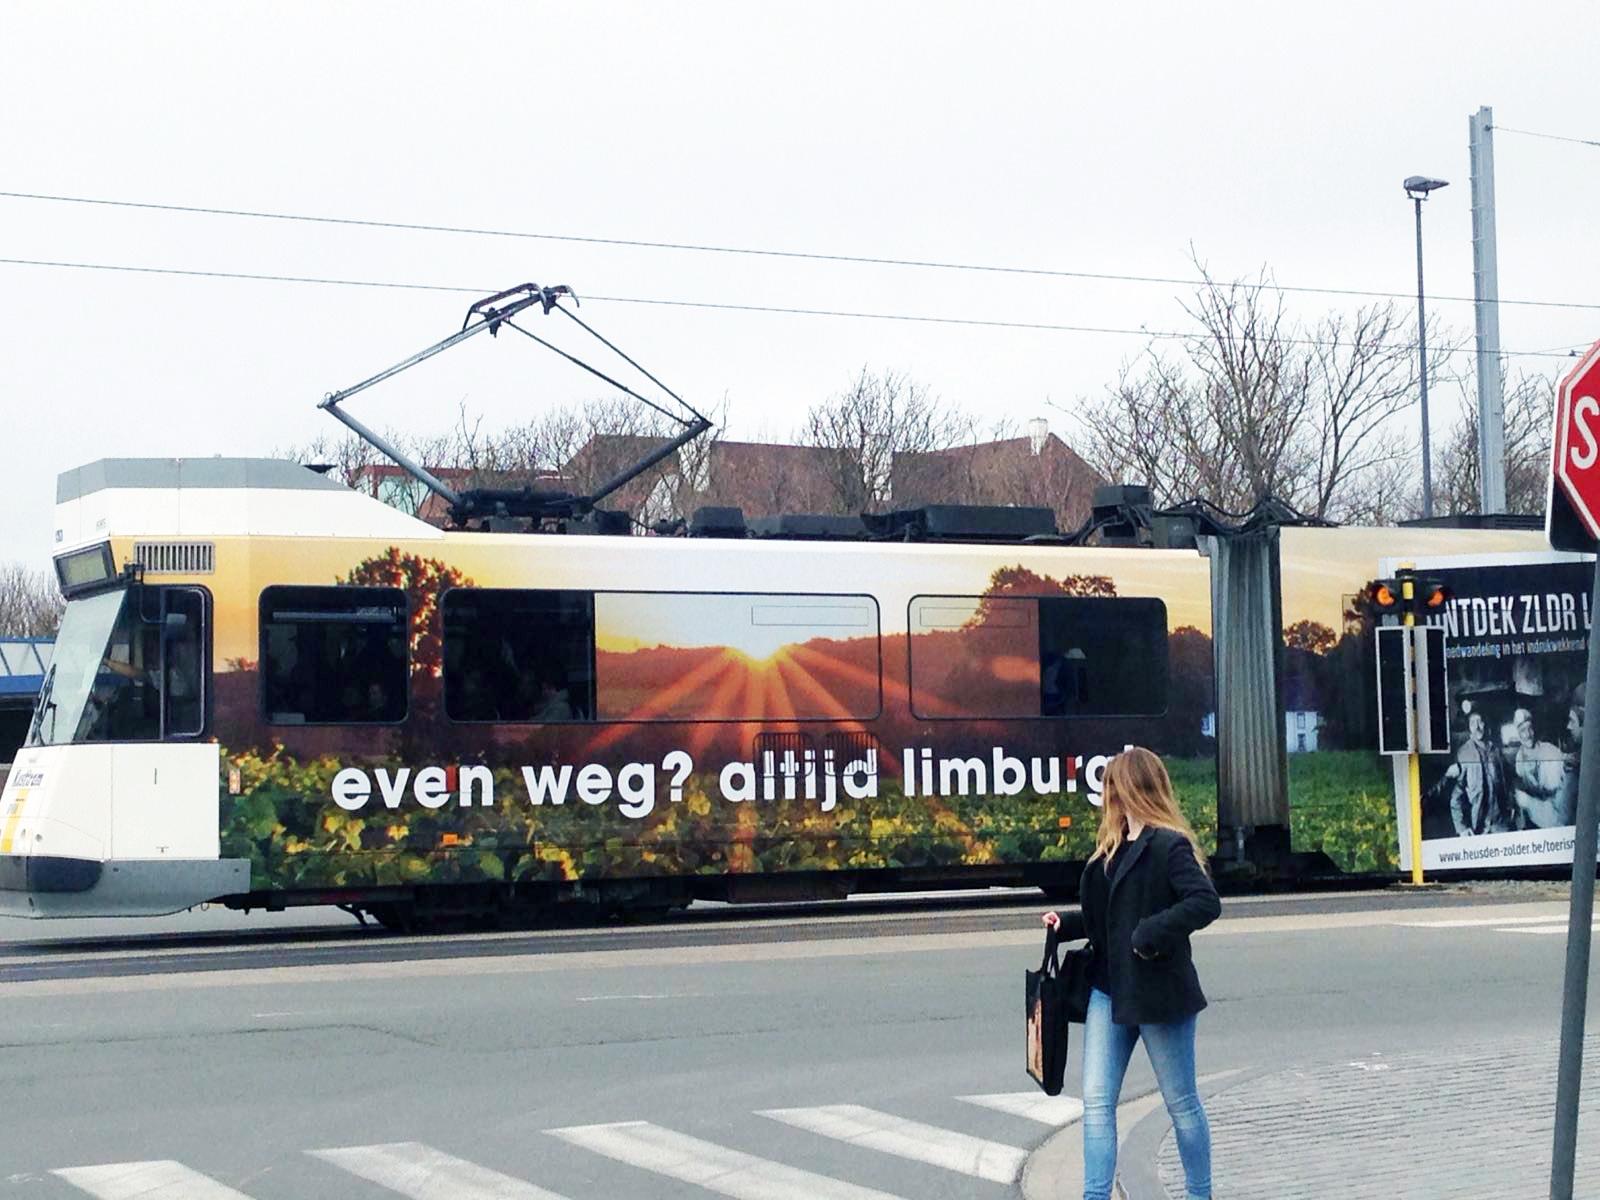 TOERISME LIMBURG PROMOOT LIMBURG OP KUSTTRAM.